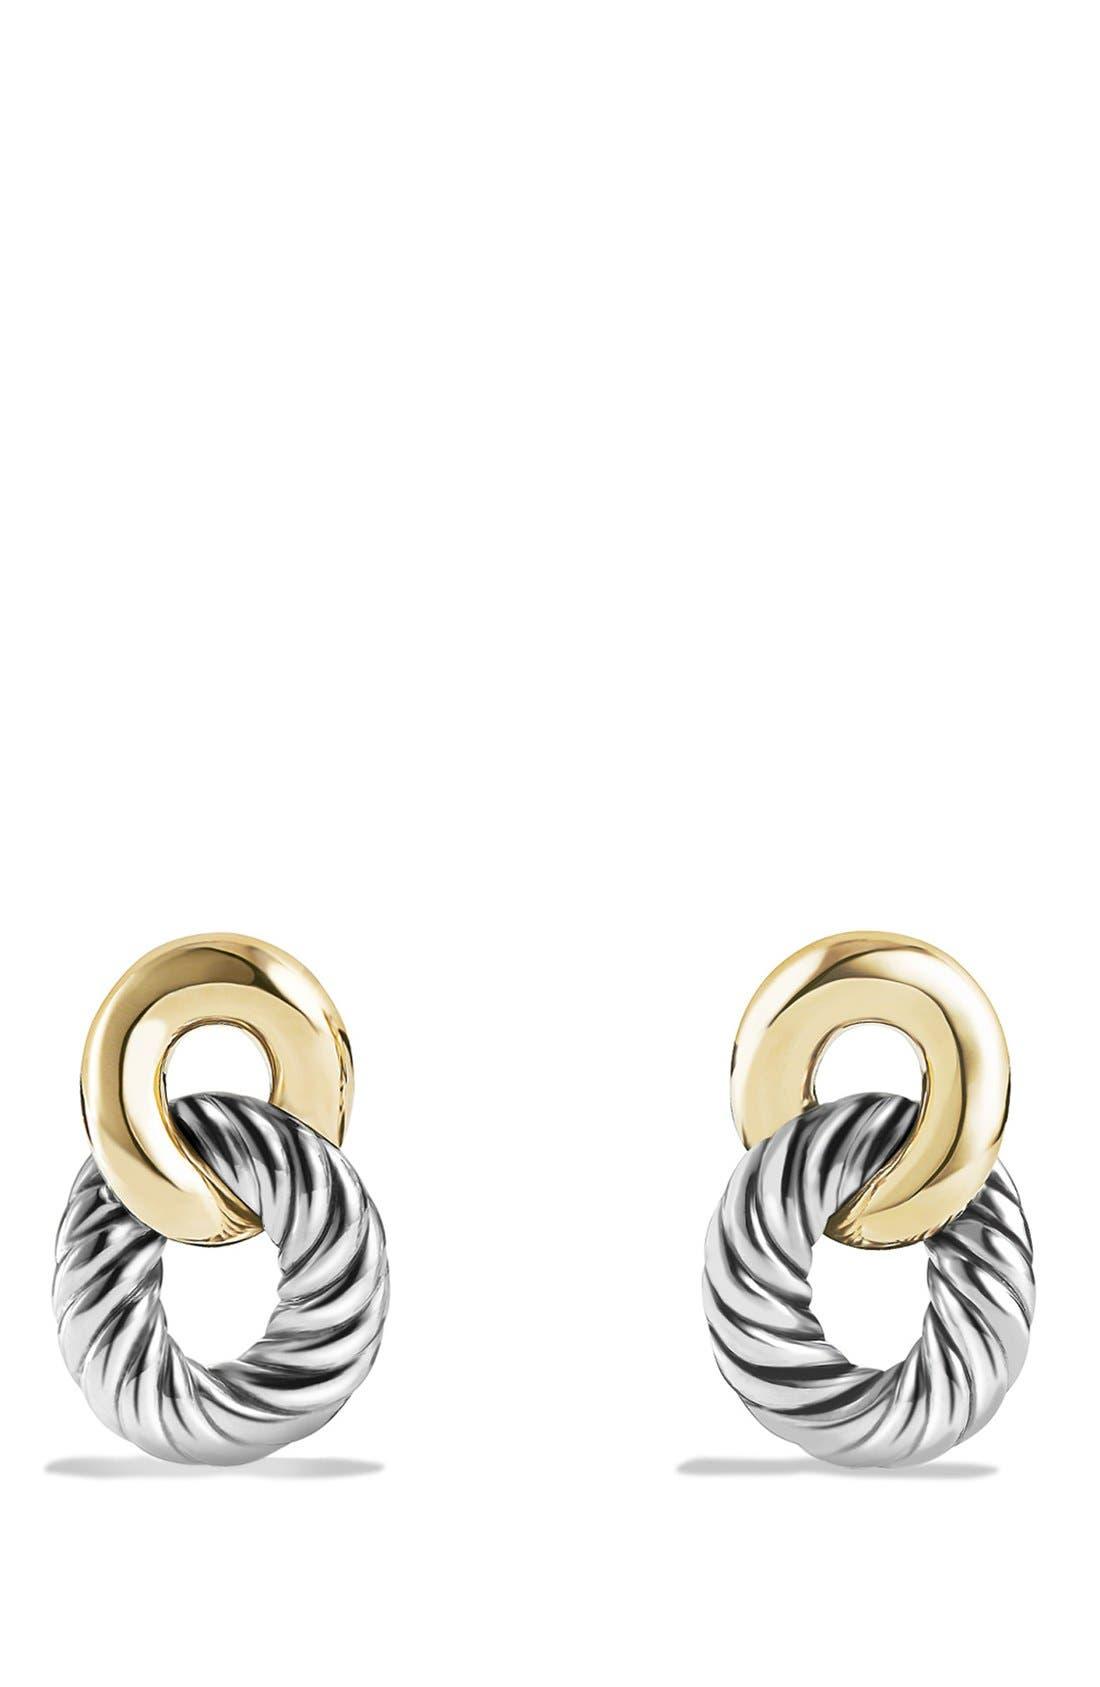 DAVID YURMAN Belmont Curb Link Drop Earrings with 18K Gold